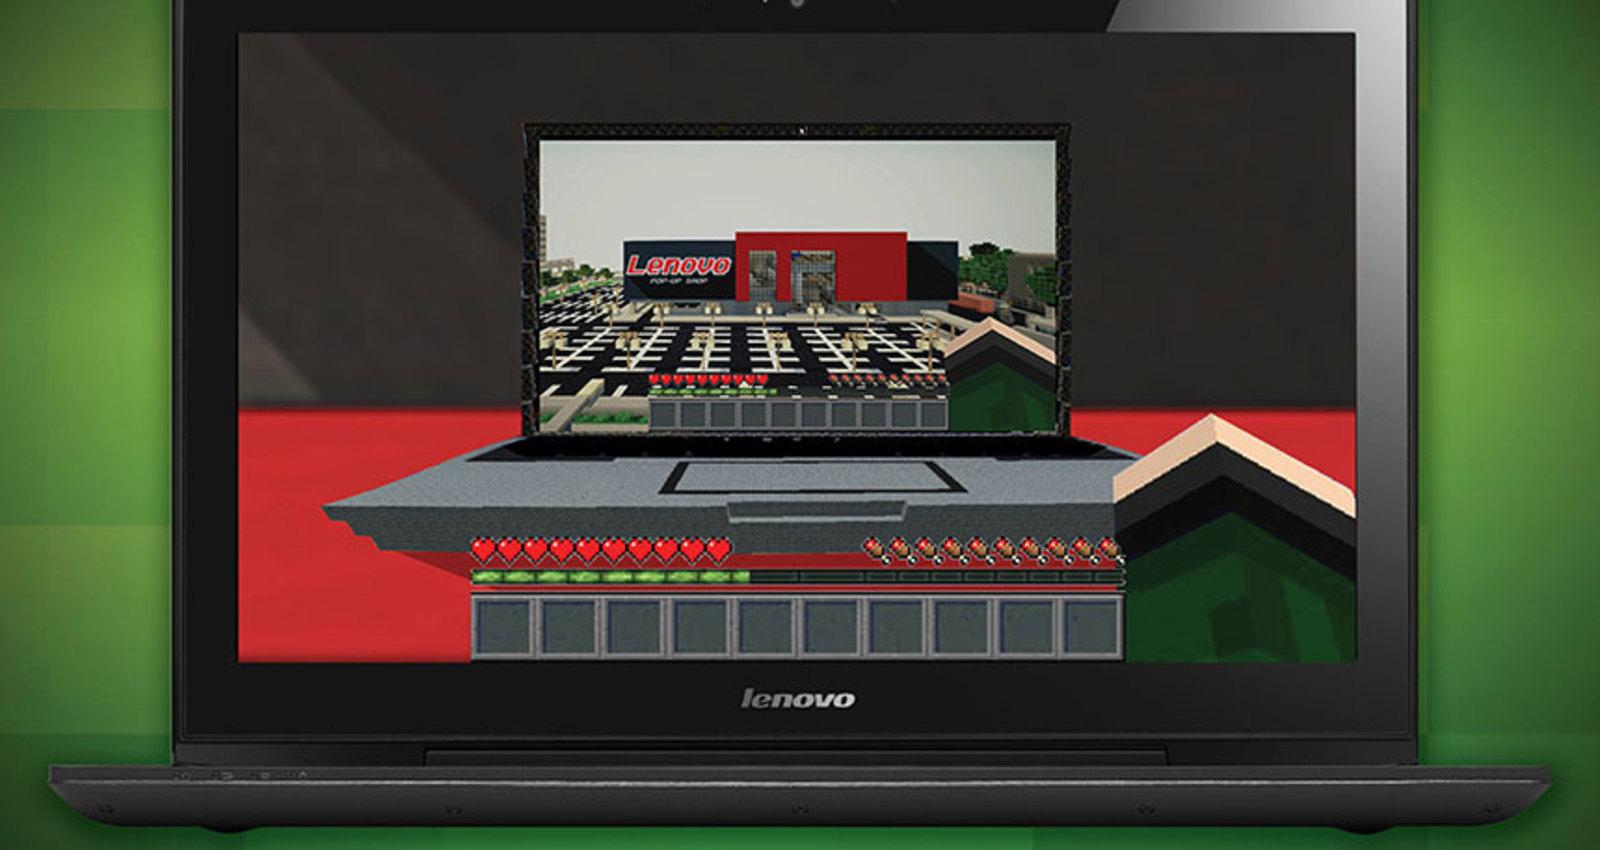 Minecraft Lenovo Digital Pop-Up Shop